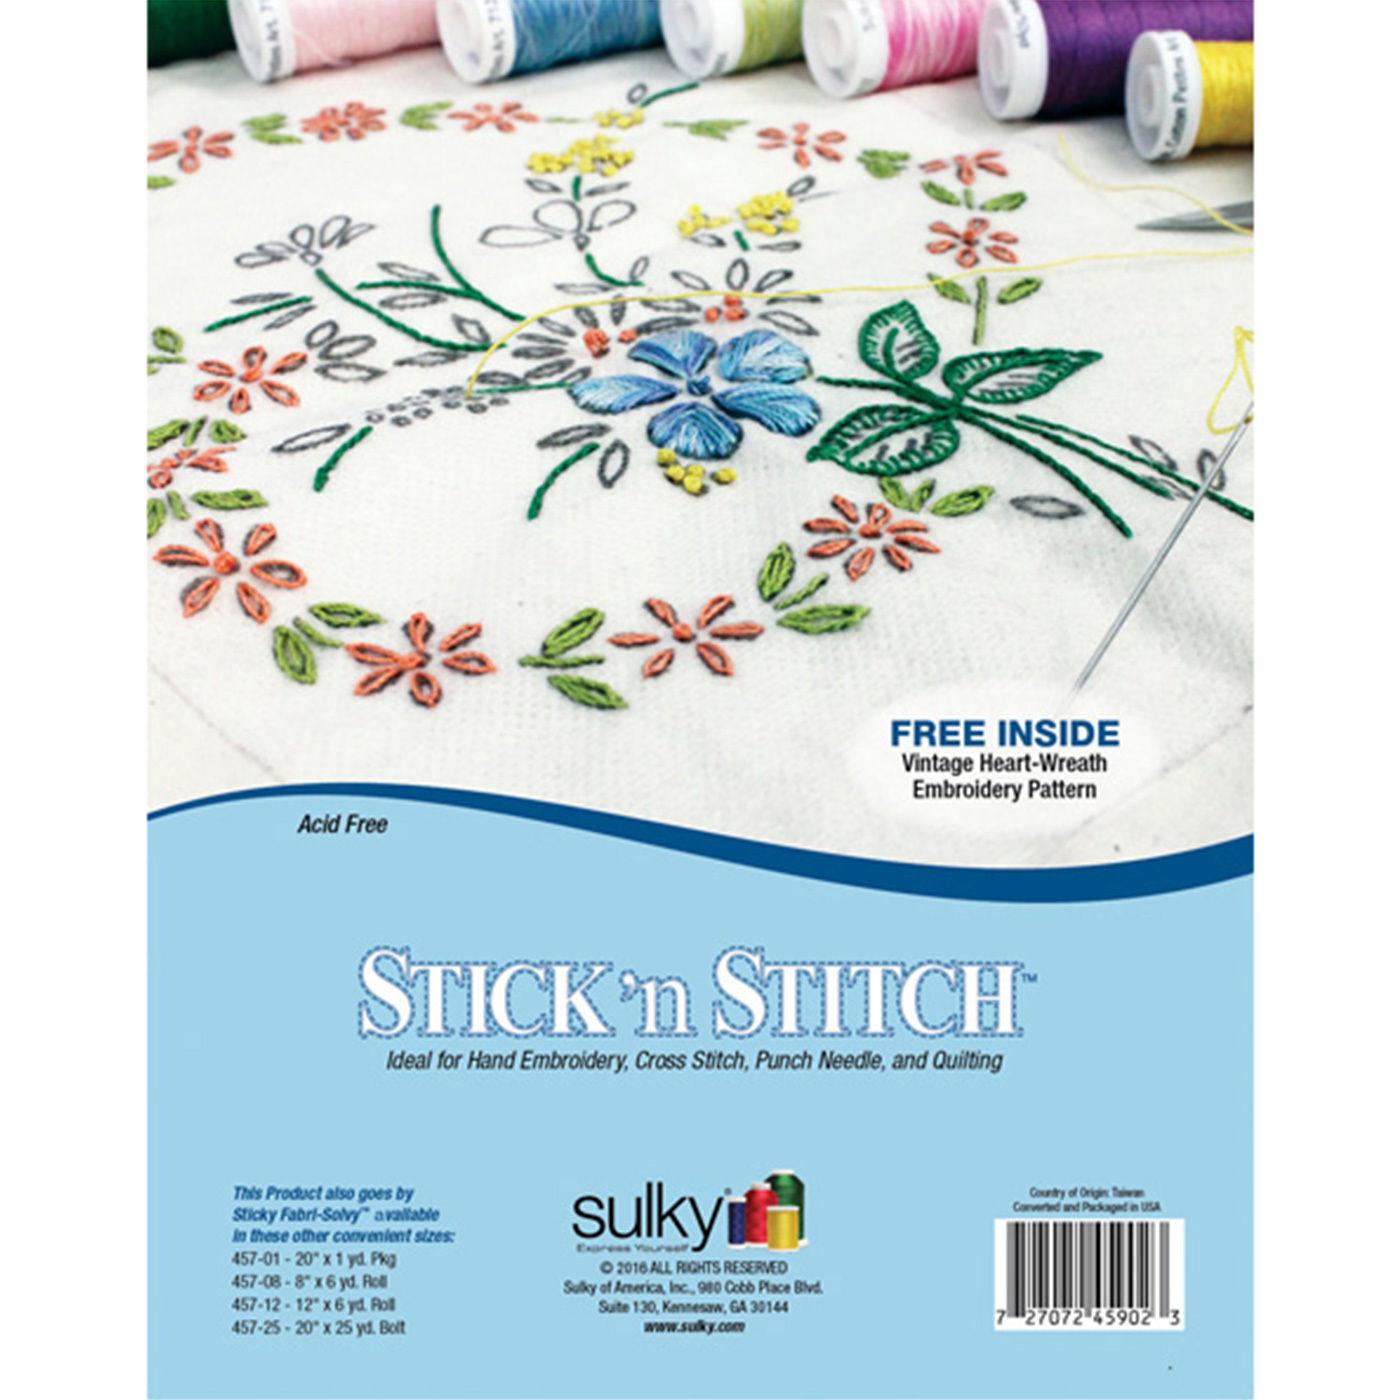 Sulky 457-25 Sticky Fabri-Solvy Stabilizer